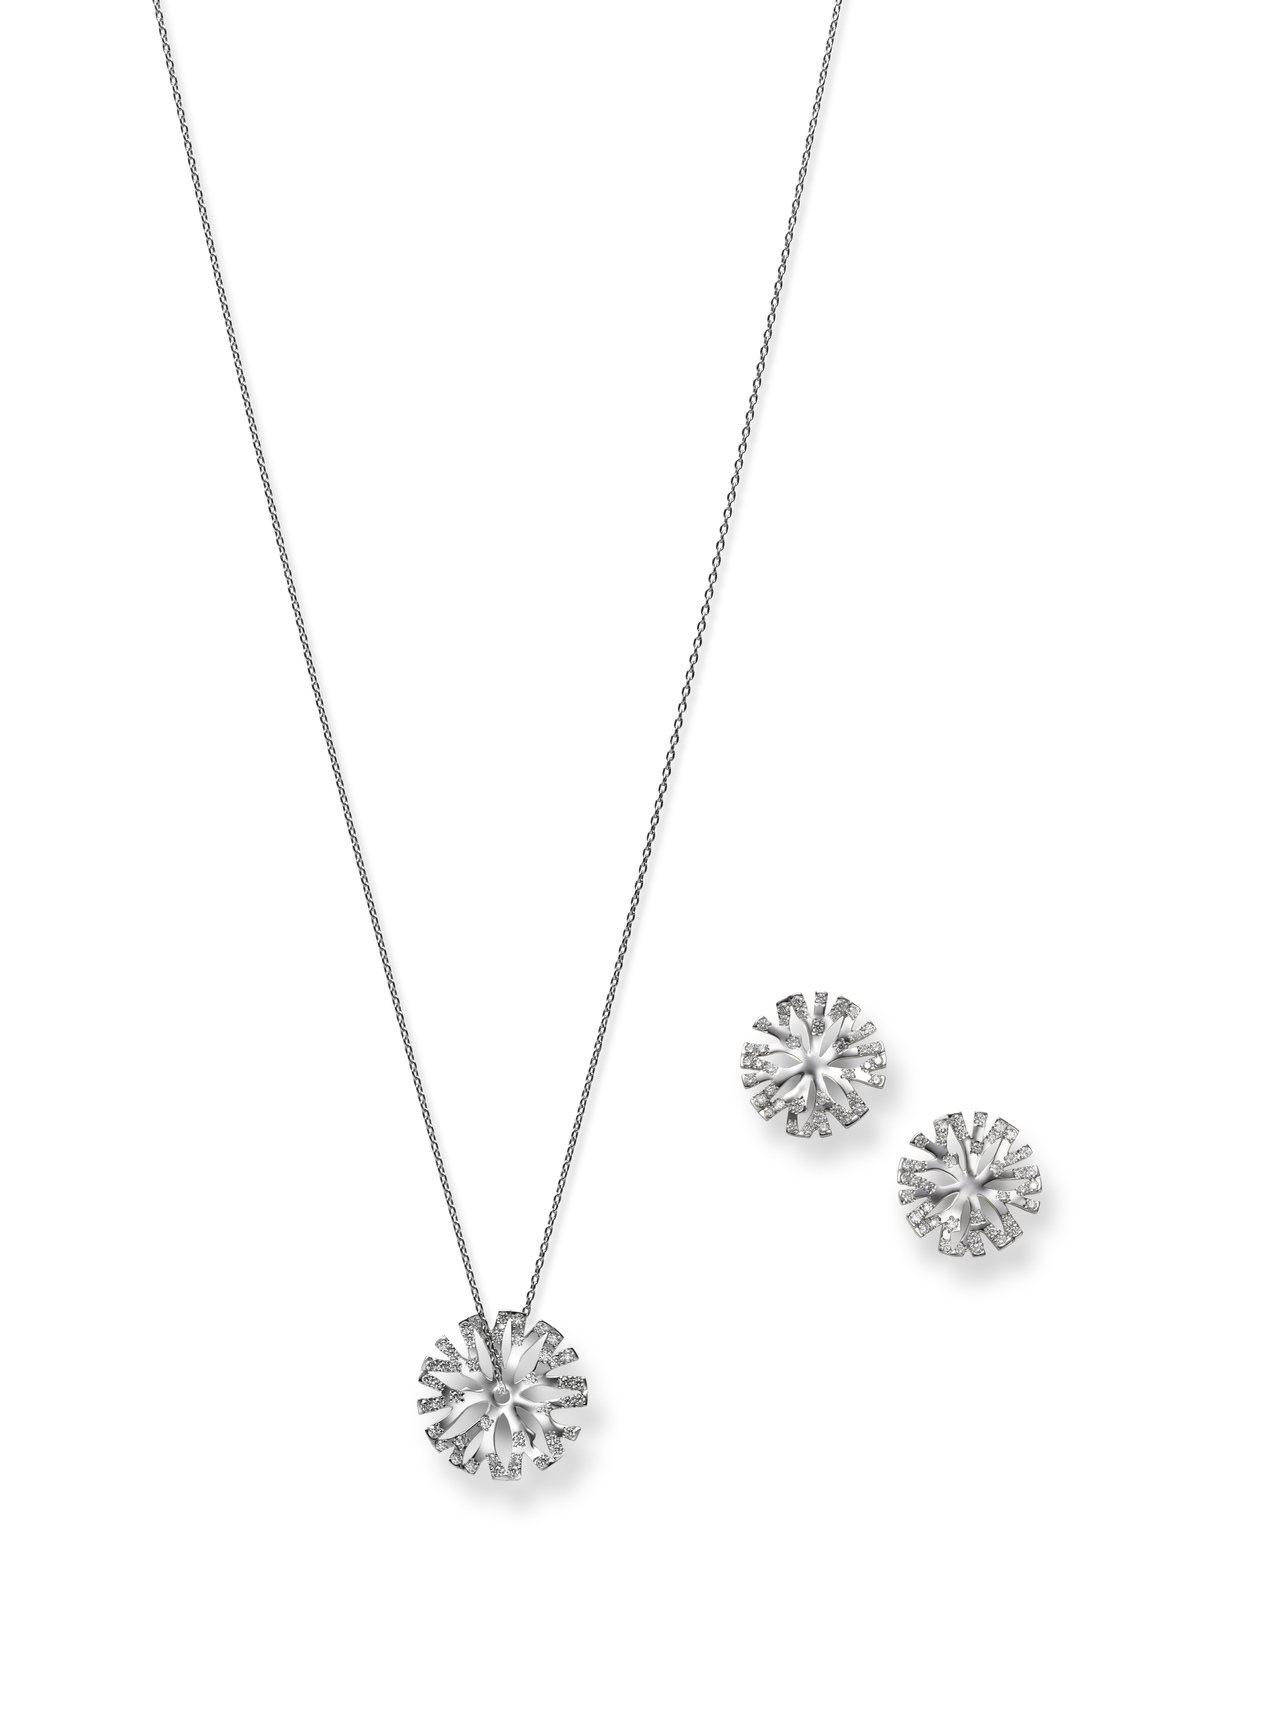 Coral Collection 18K白金鑽石墜鍊17萬7,000元、耳環21...